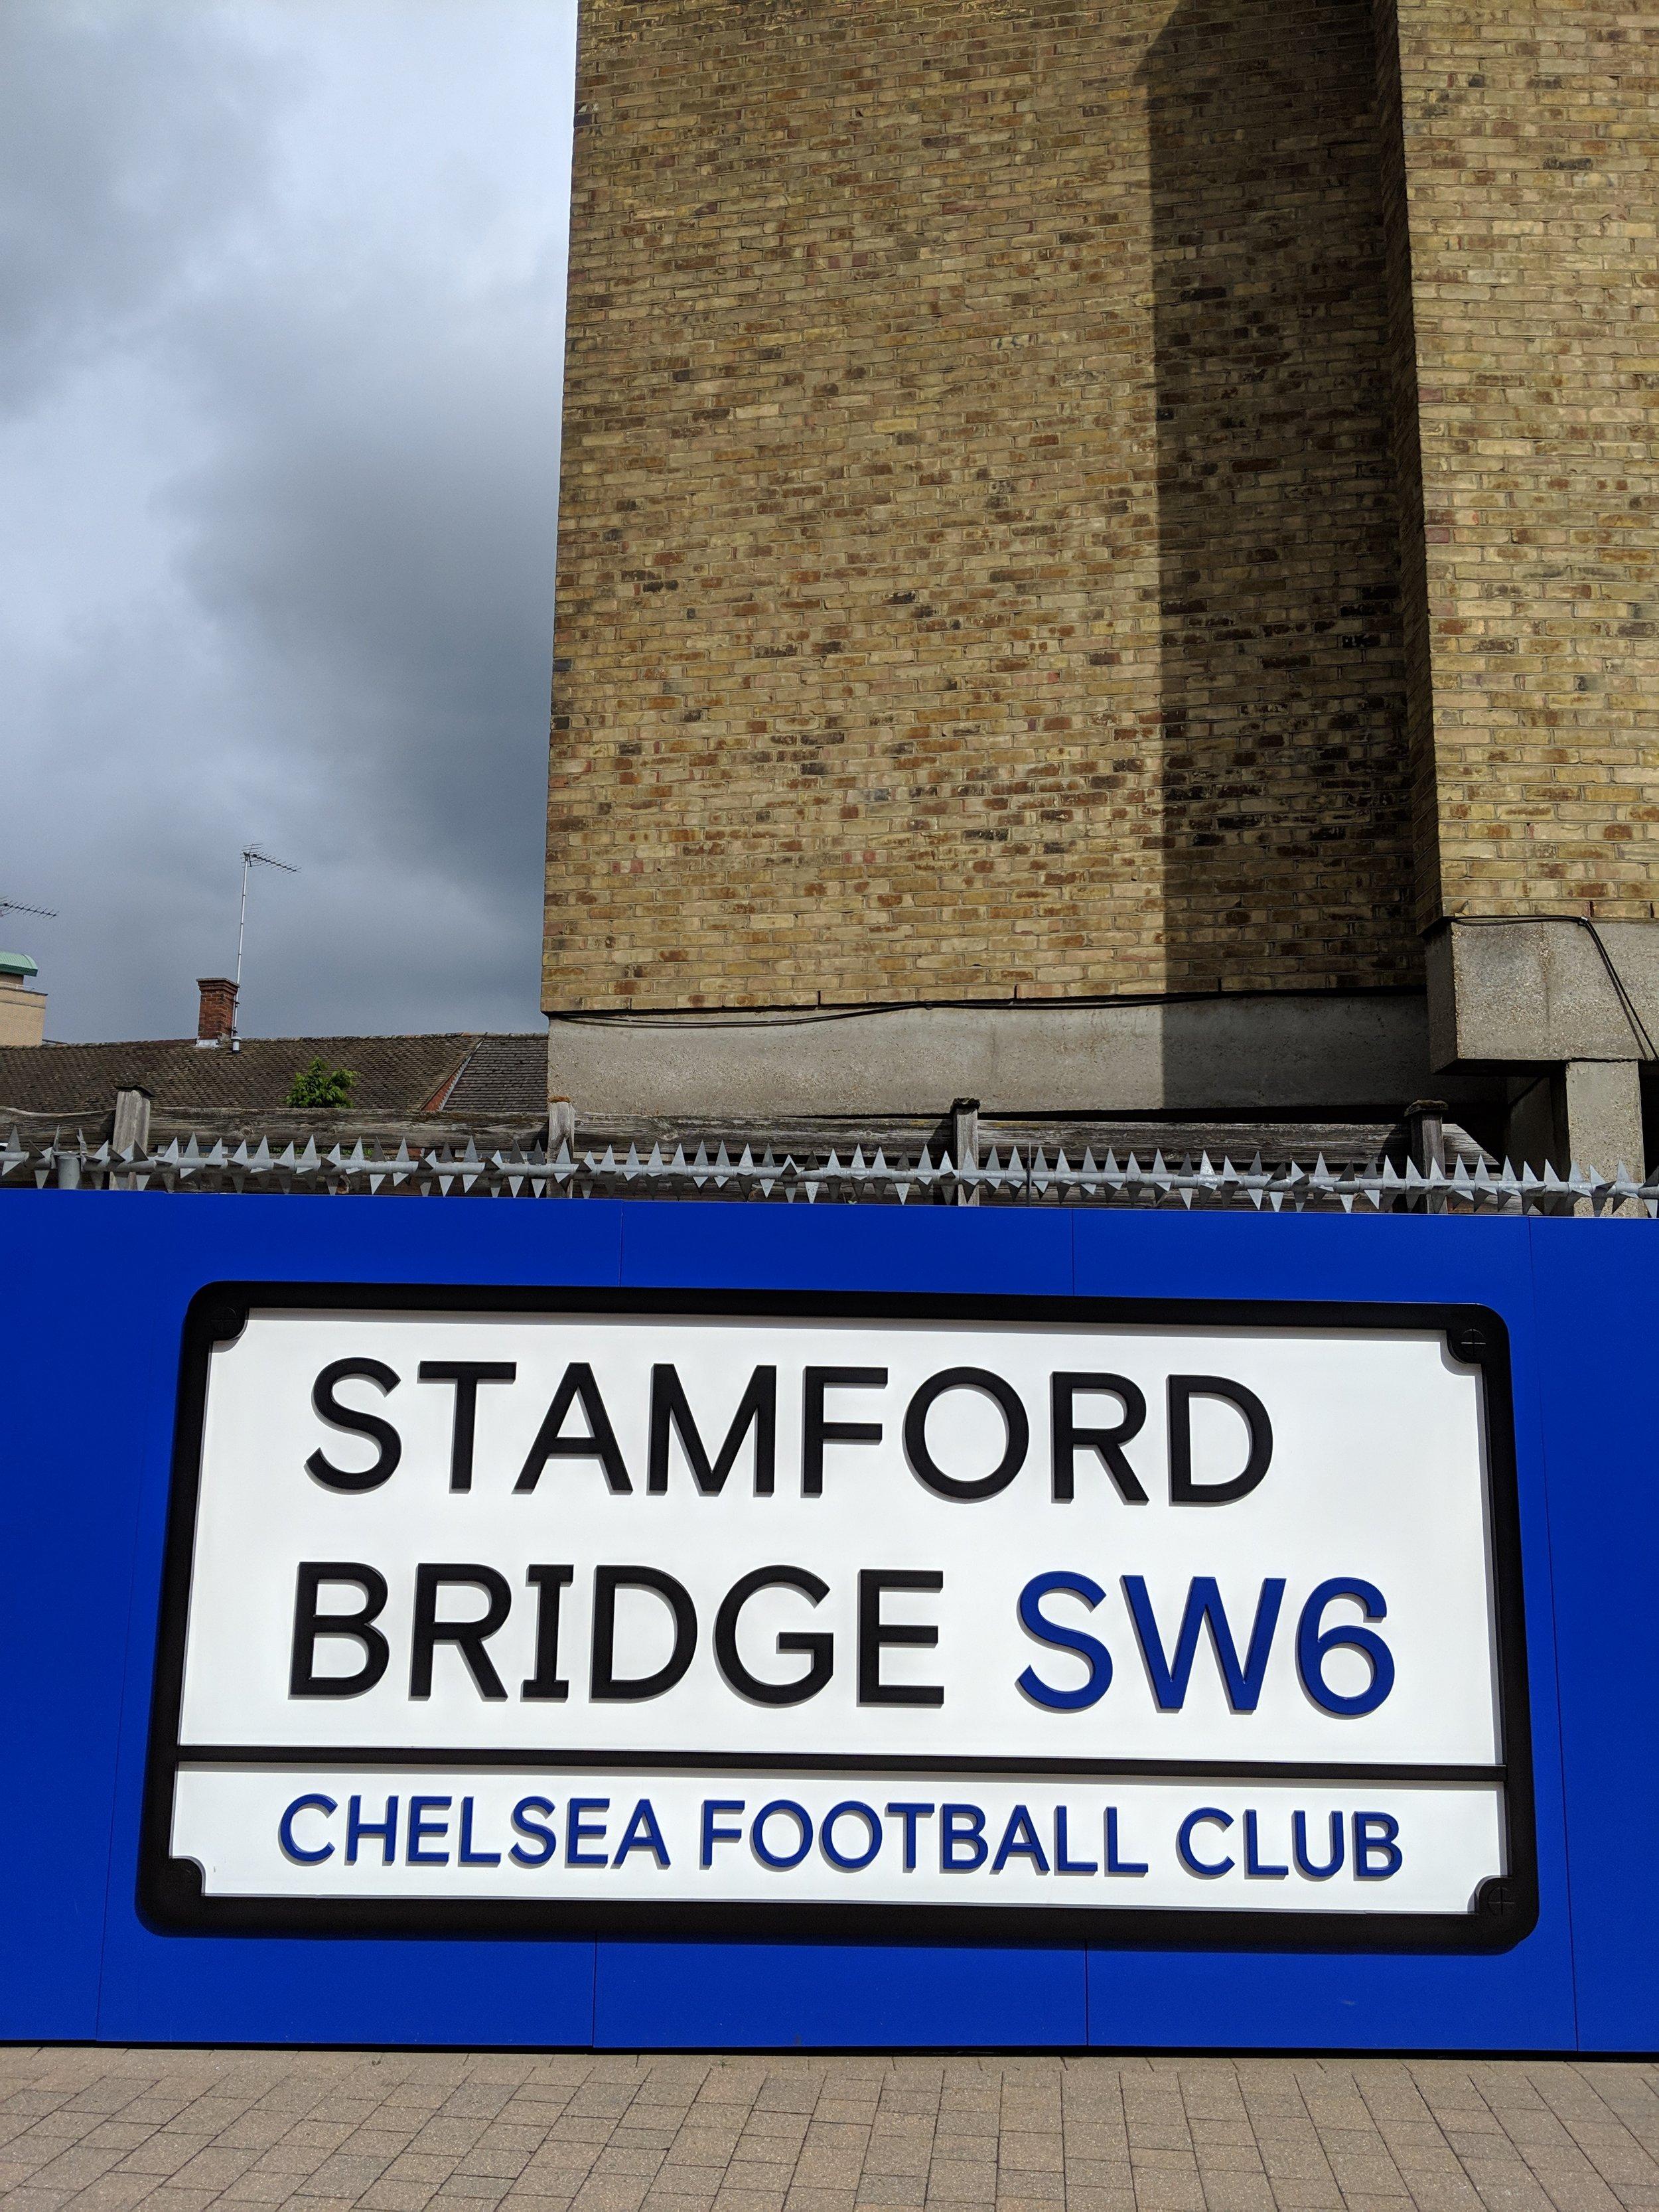 At home football matches - Sat 5: Fulham vs Charlton @ 12:30Sat 19: Chelsea vs Newcastle @15:00Weds 23: Fulham vs Luton Town @19:45Tues 29: Chelsea vs Manchester United @19:45